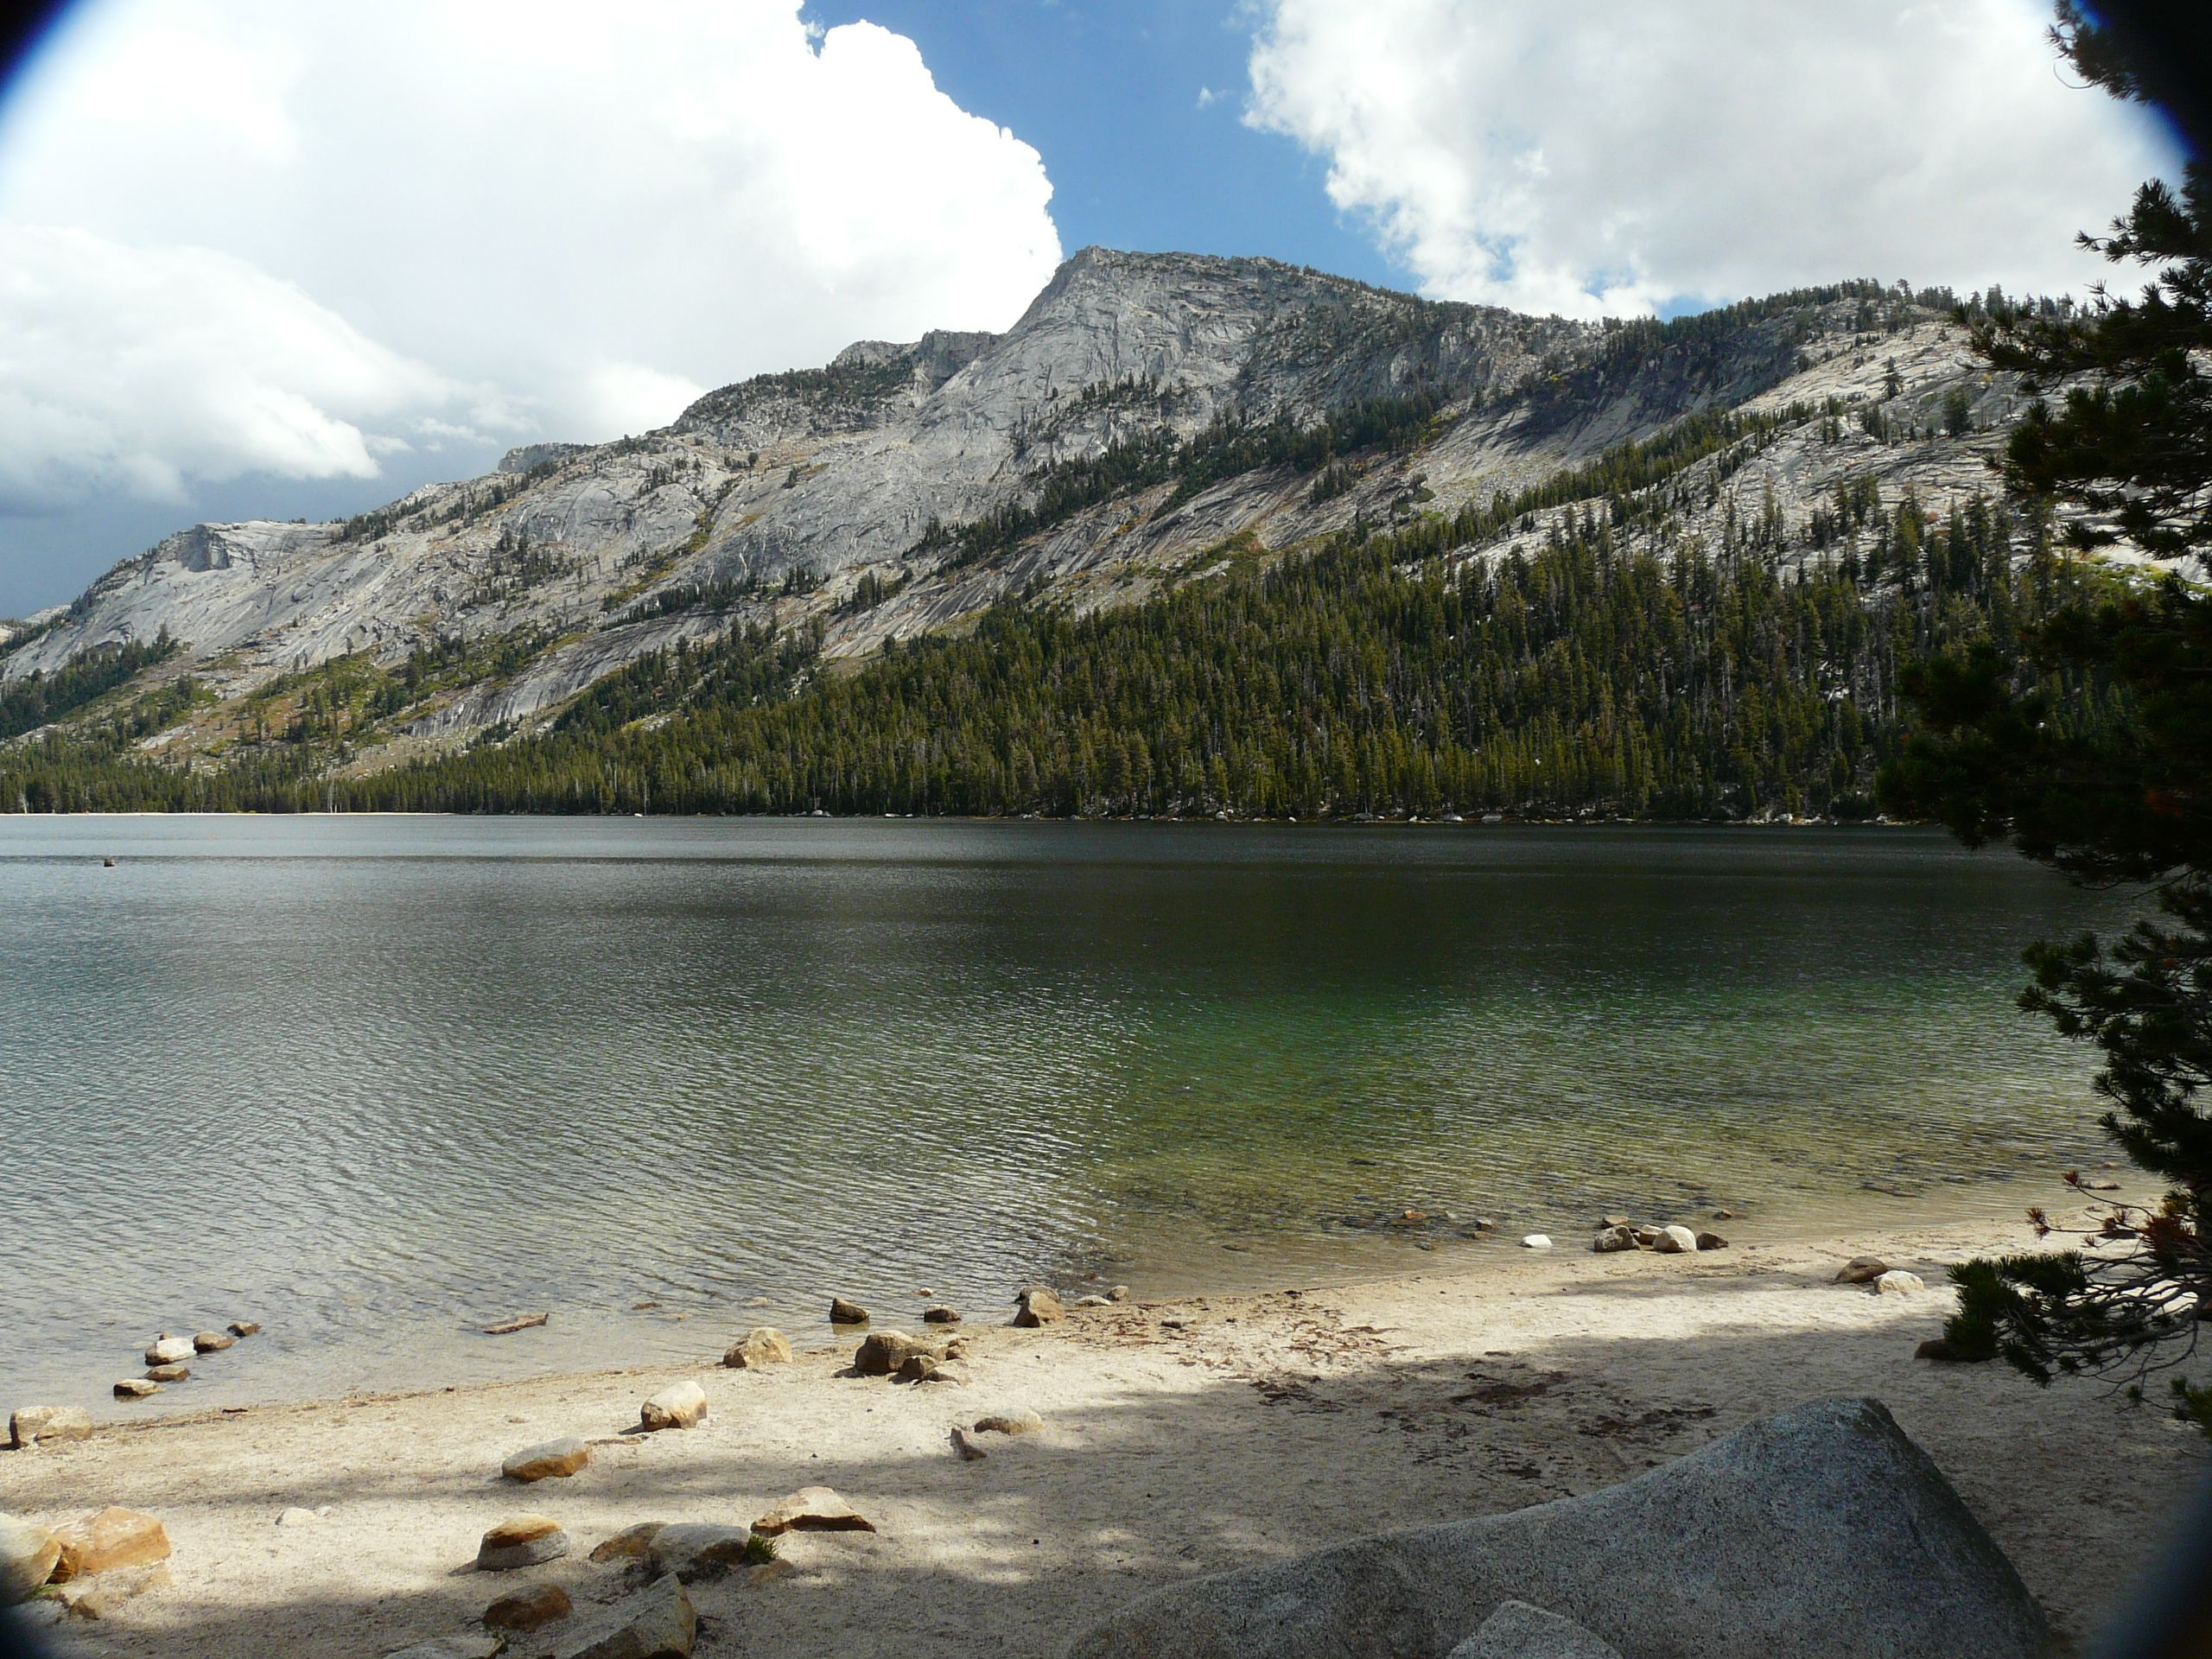 Pin on California/Yosemite